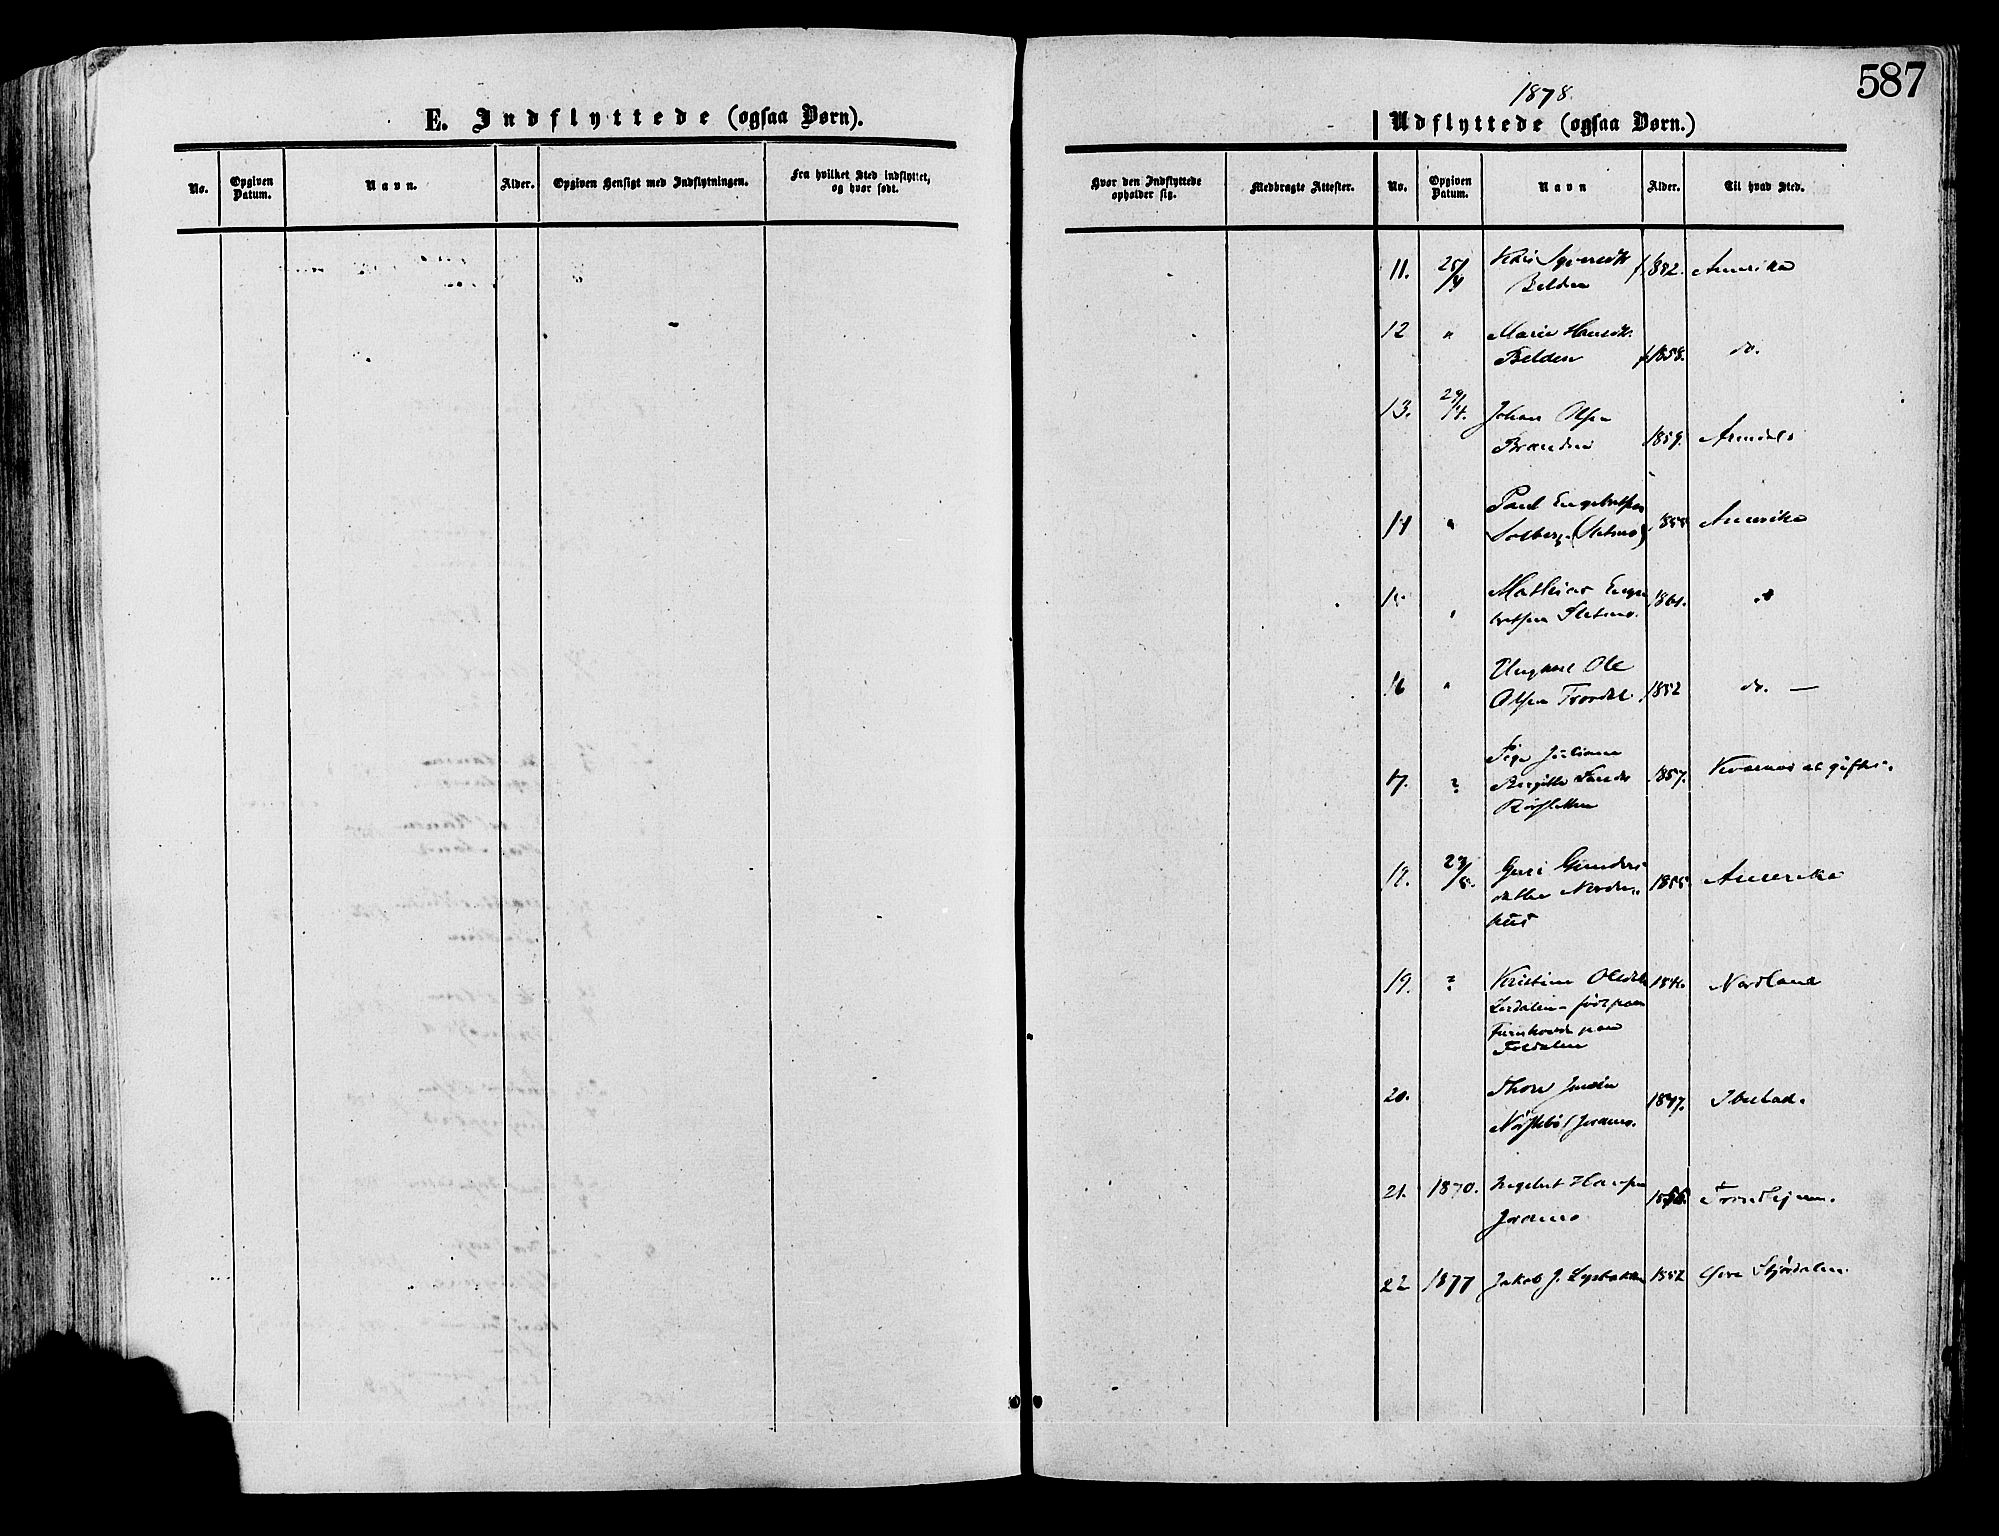 SAH, Lesja prestekontor, Ministerialbok nr. 8, 1854-1880, s. 587